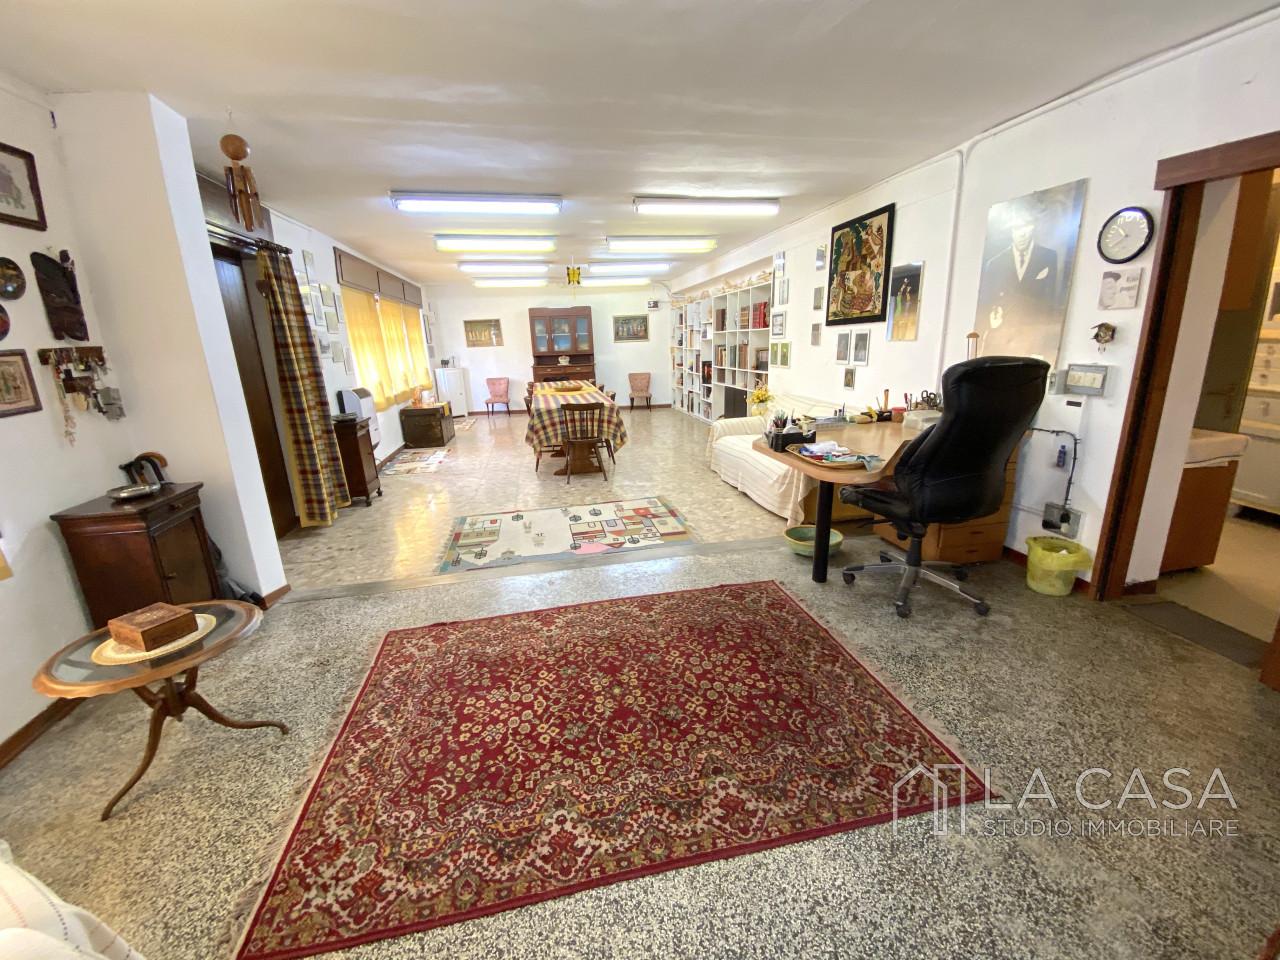 Palazzo plurifamiliare in vendita a Valvasone Arzene - Rif. P3 https://images.gestionaleimmobiliare.it/foto/annunci/200827/2284141/1280x1280/002__img_3703_wmk_0.jpg